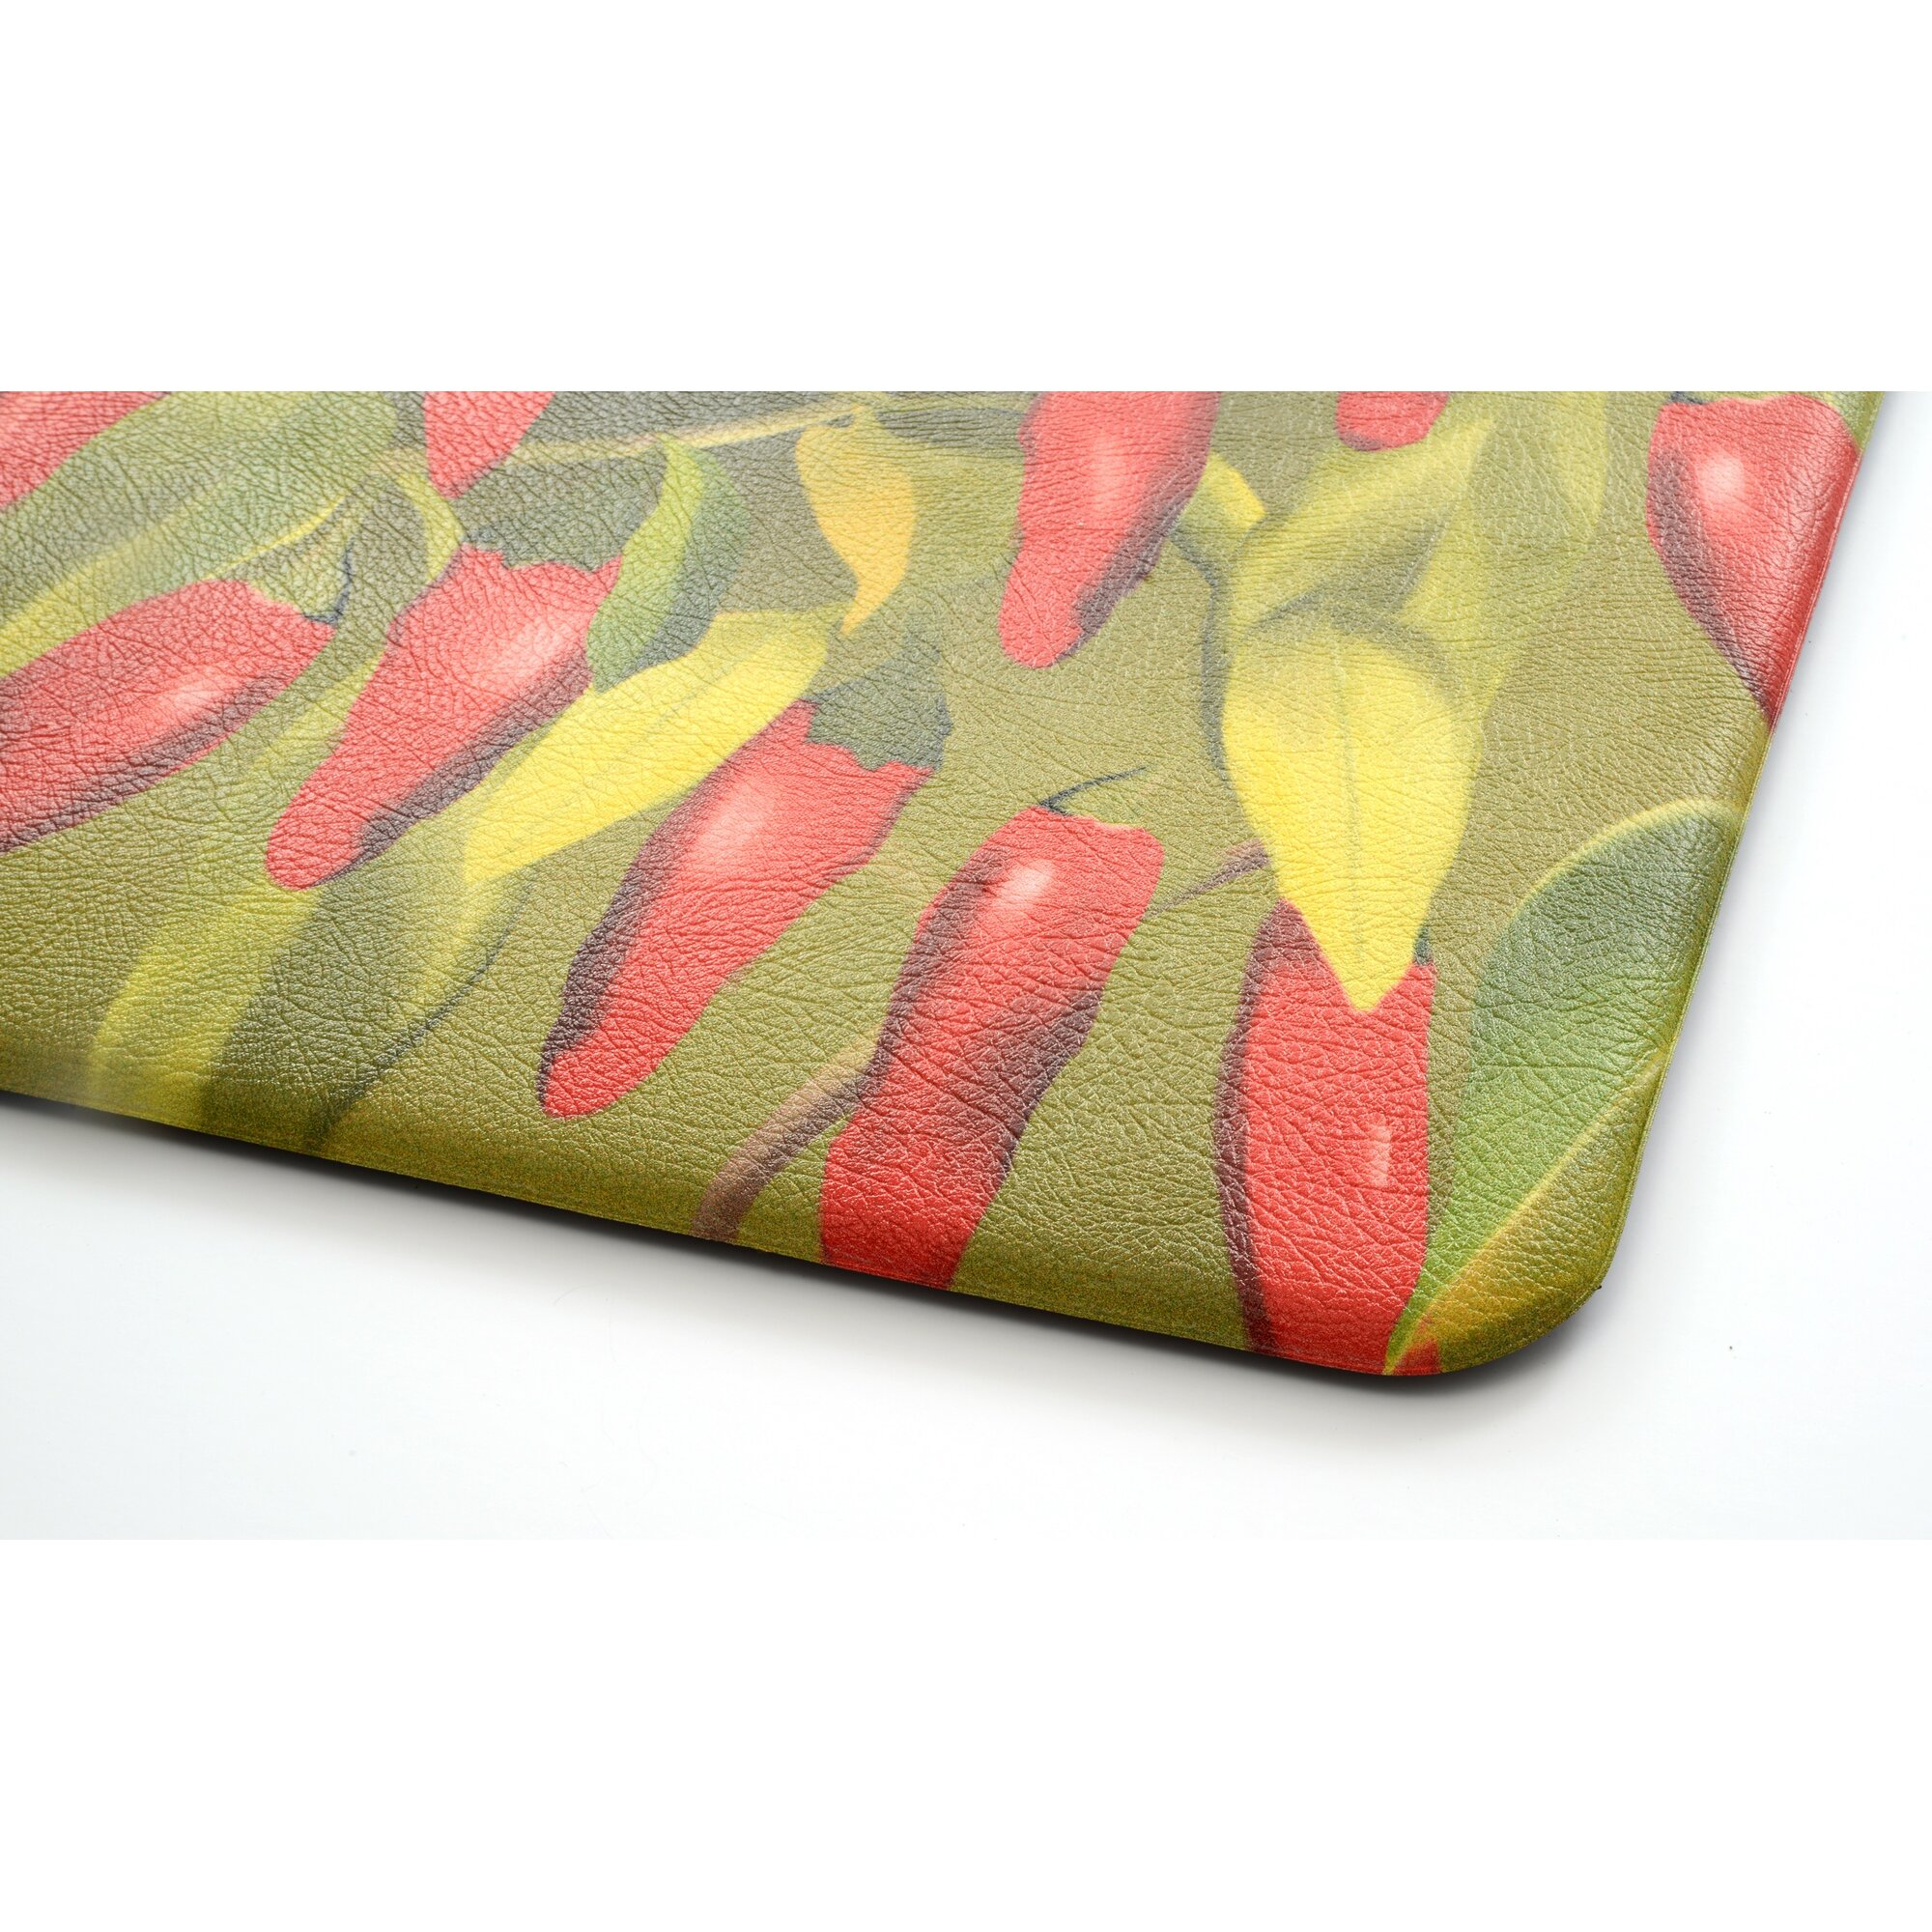 kitchen rugs chili peppers kitchen design